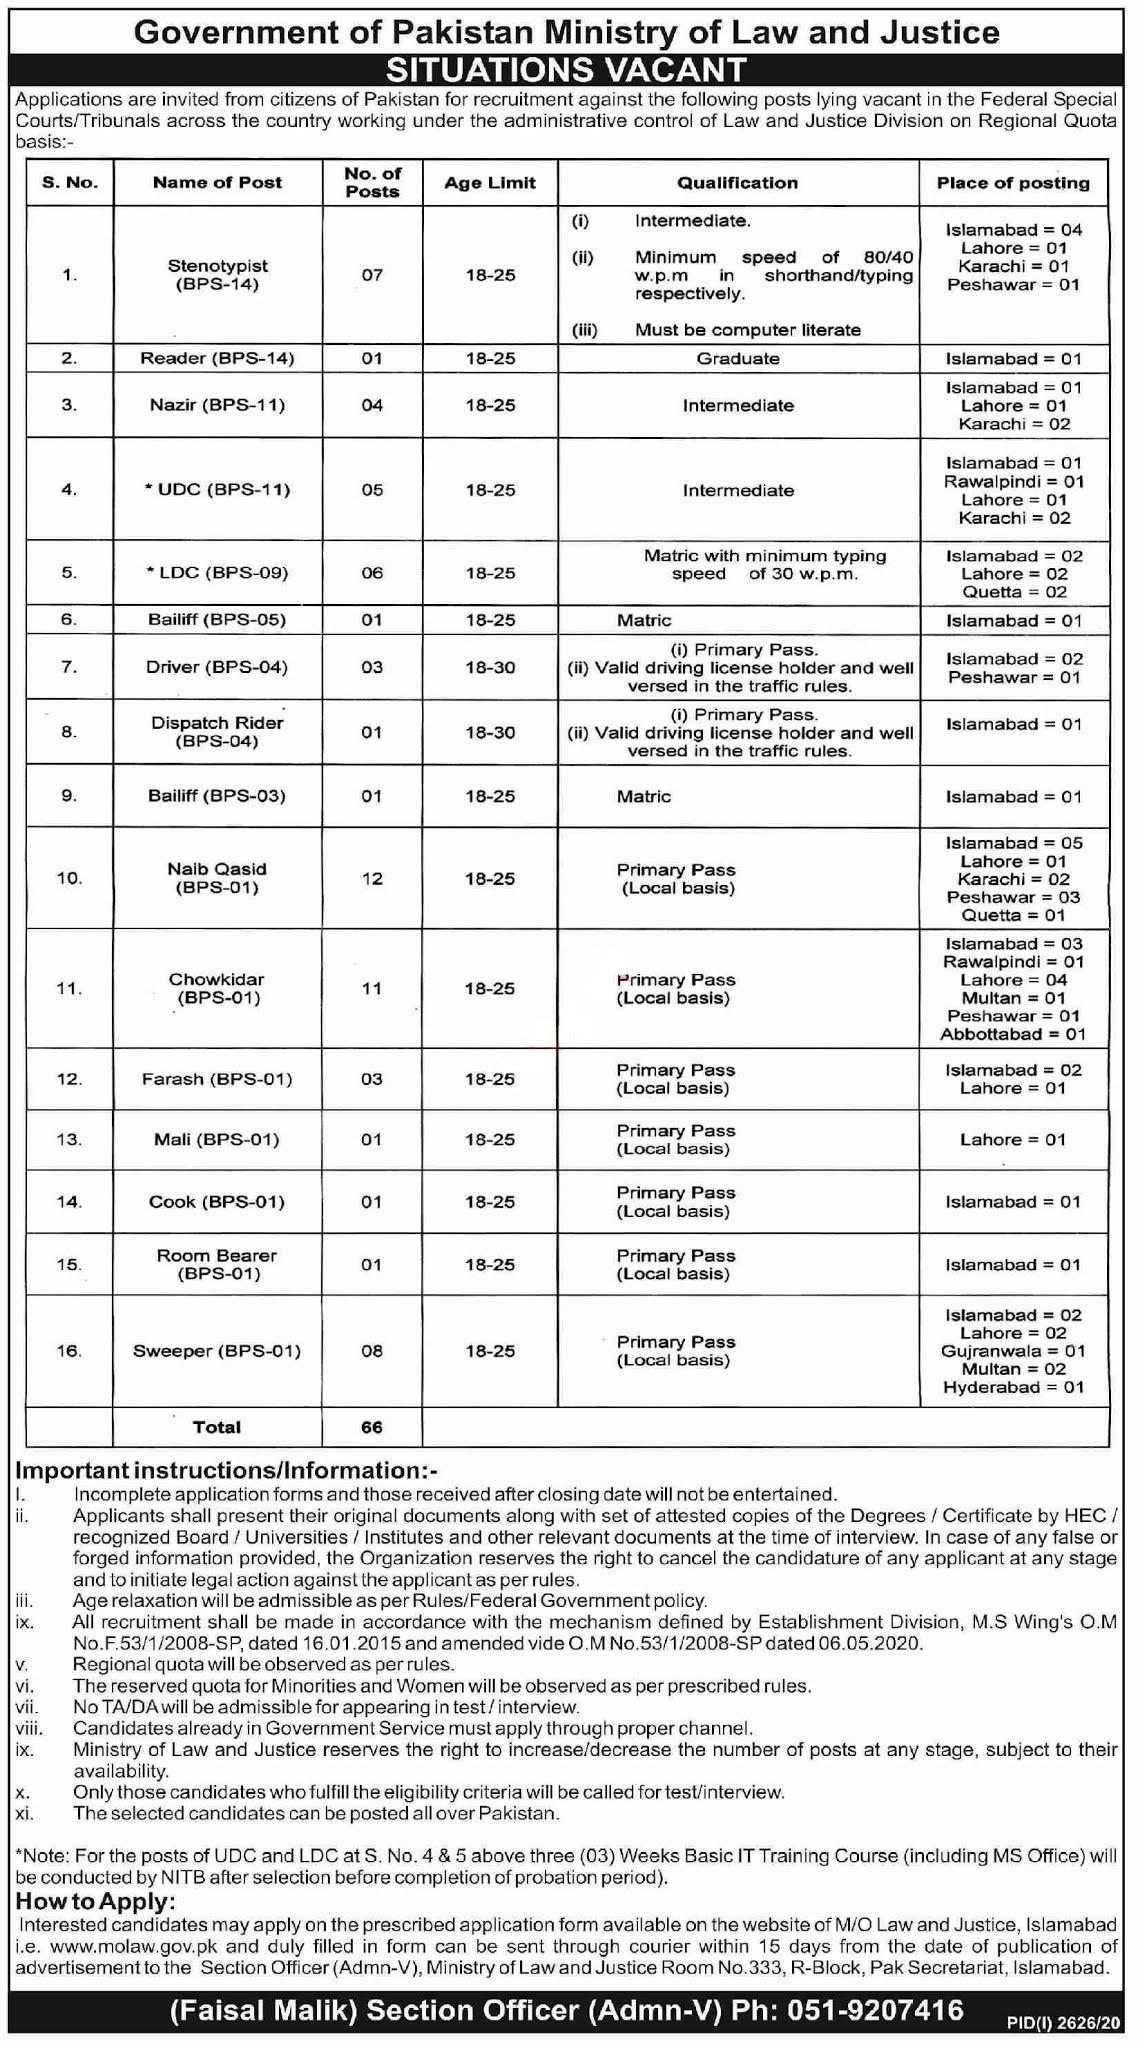 Federal Special Courts & Tribunals Jobs 2020 for Stenotypist, Reader, Nazir, UDC, Upper Division Clerk, Clerk, LDC, Lower Division Clerk, Bailiff, Driver, LTV Driver and more